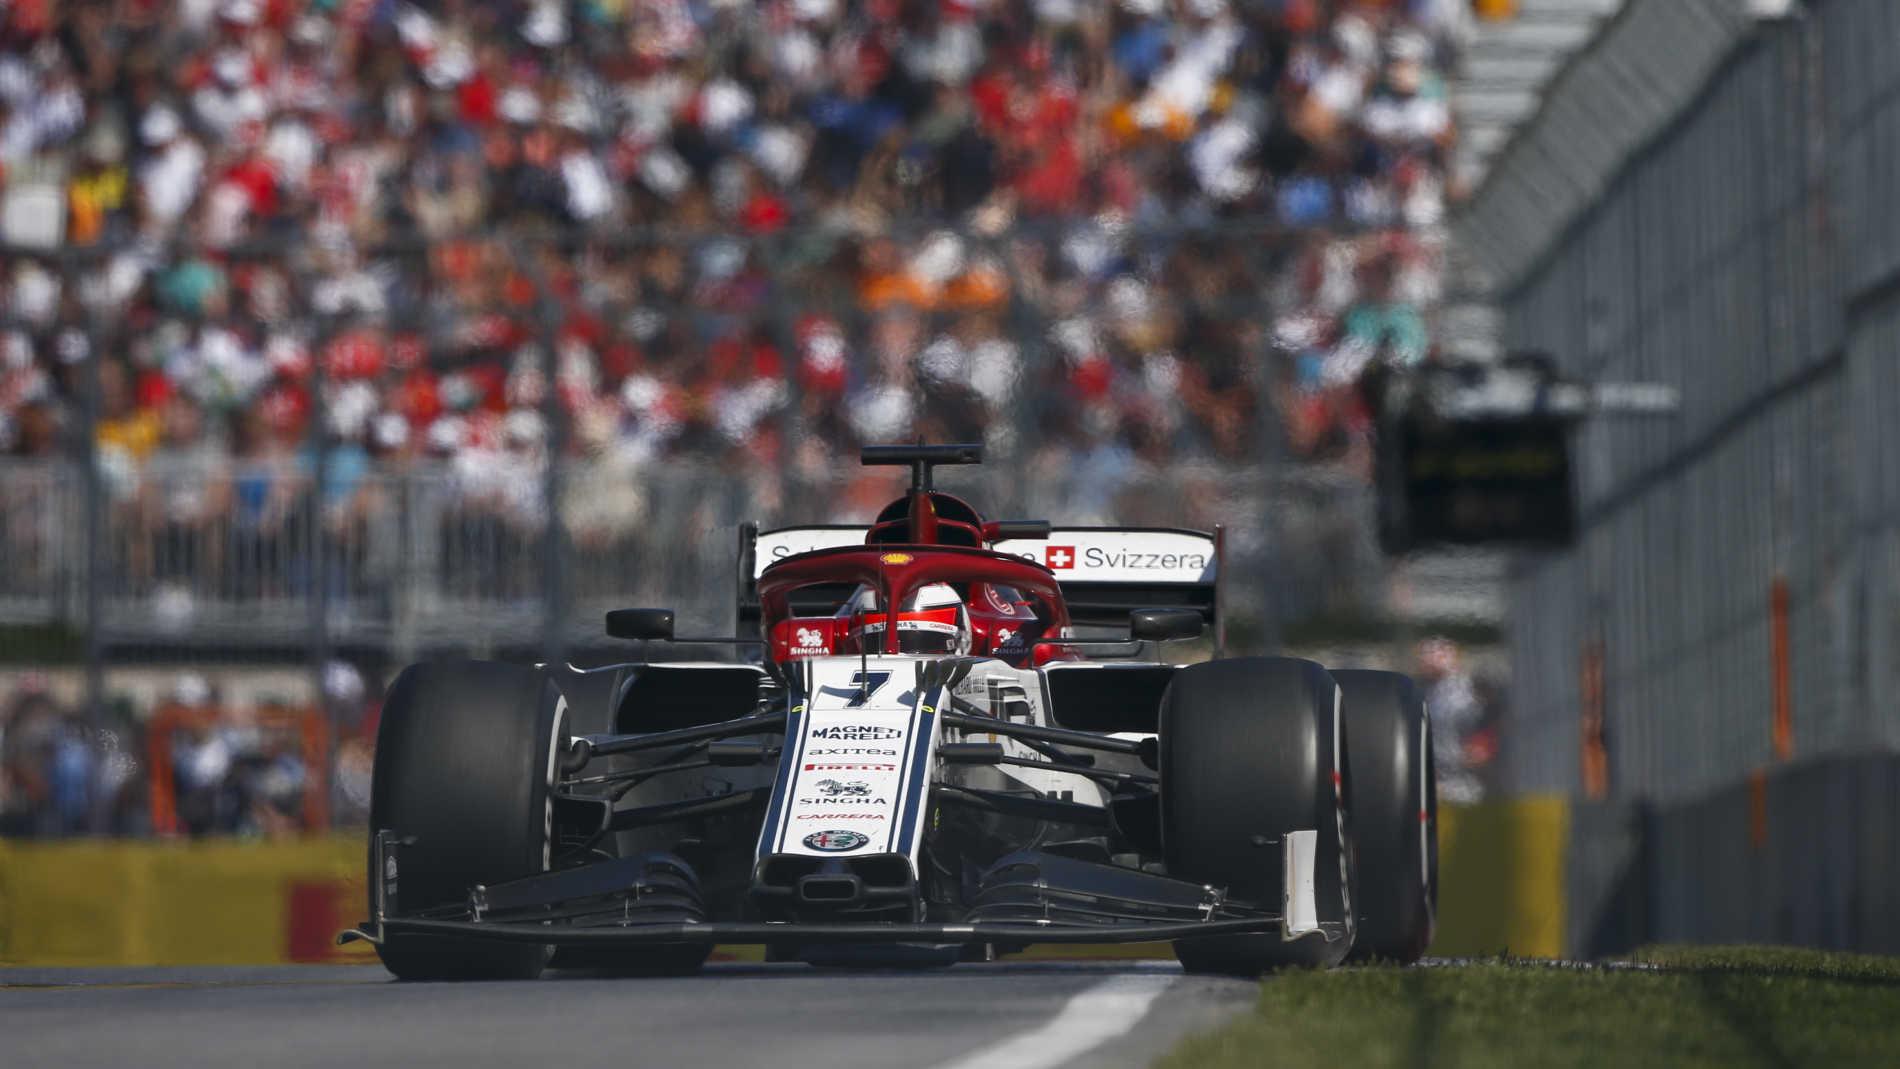 2019 Canadian GP